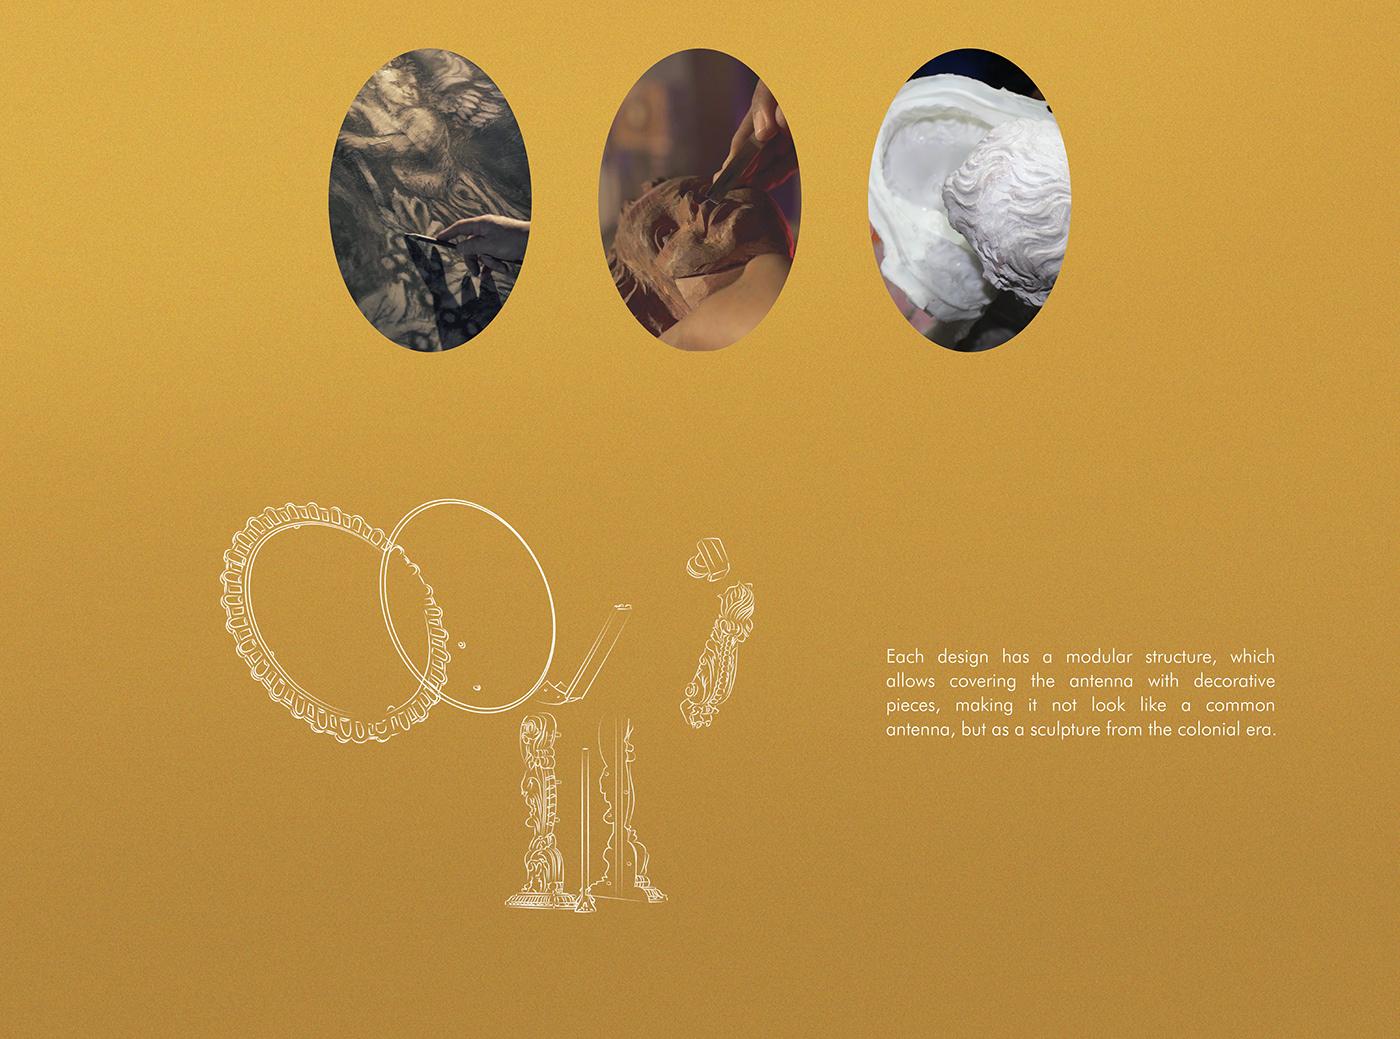 sculpture craft quito colonial receptors Advertising  Cannes DirecTV design heritage